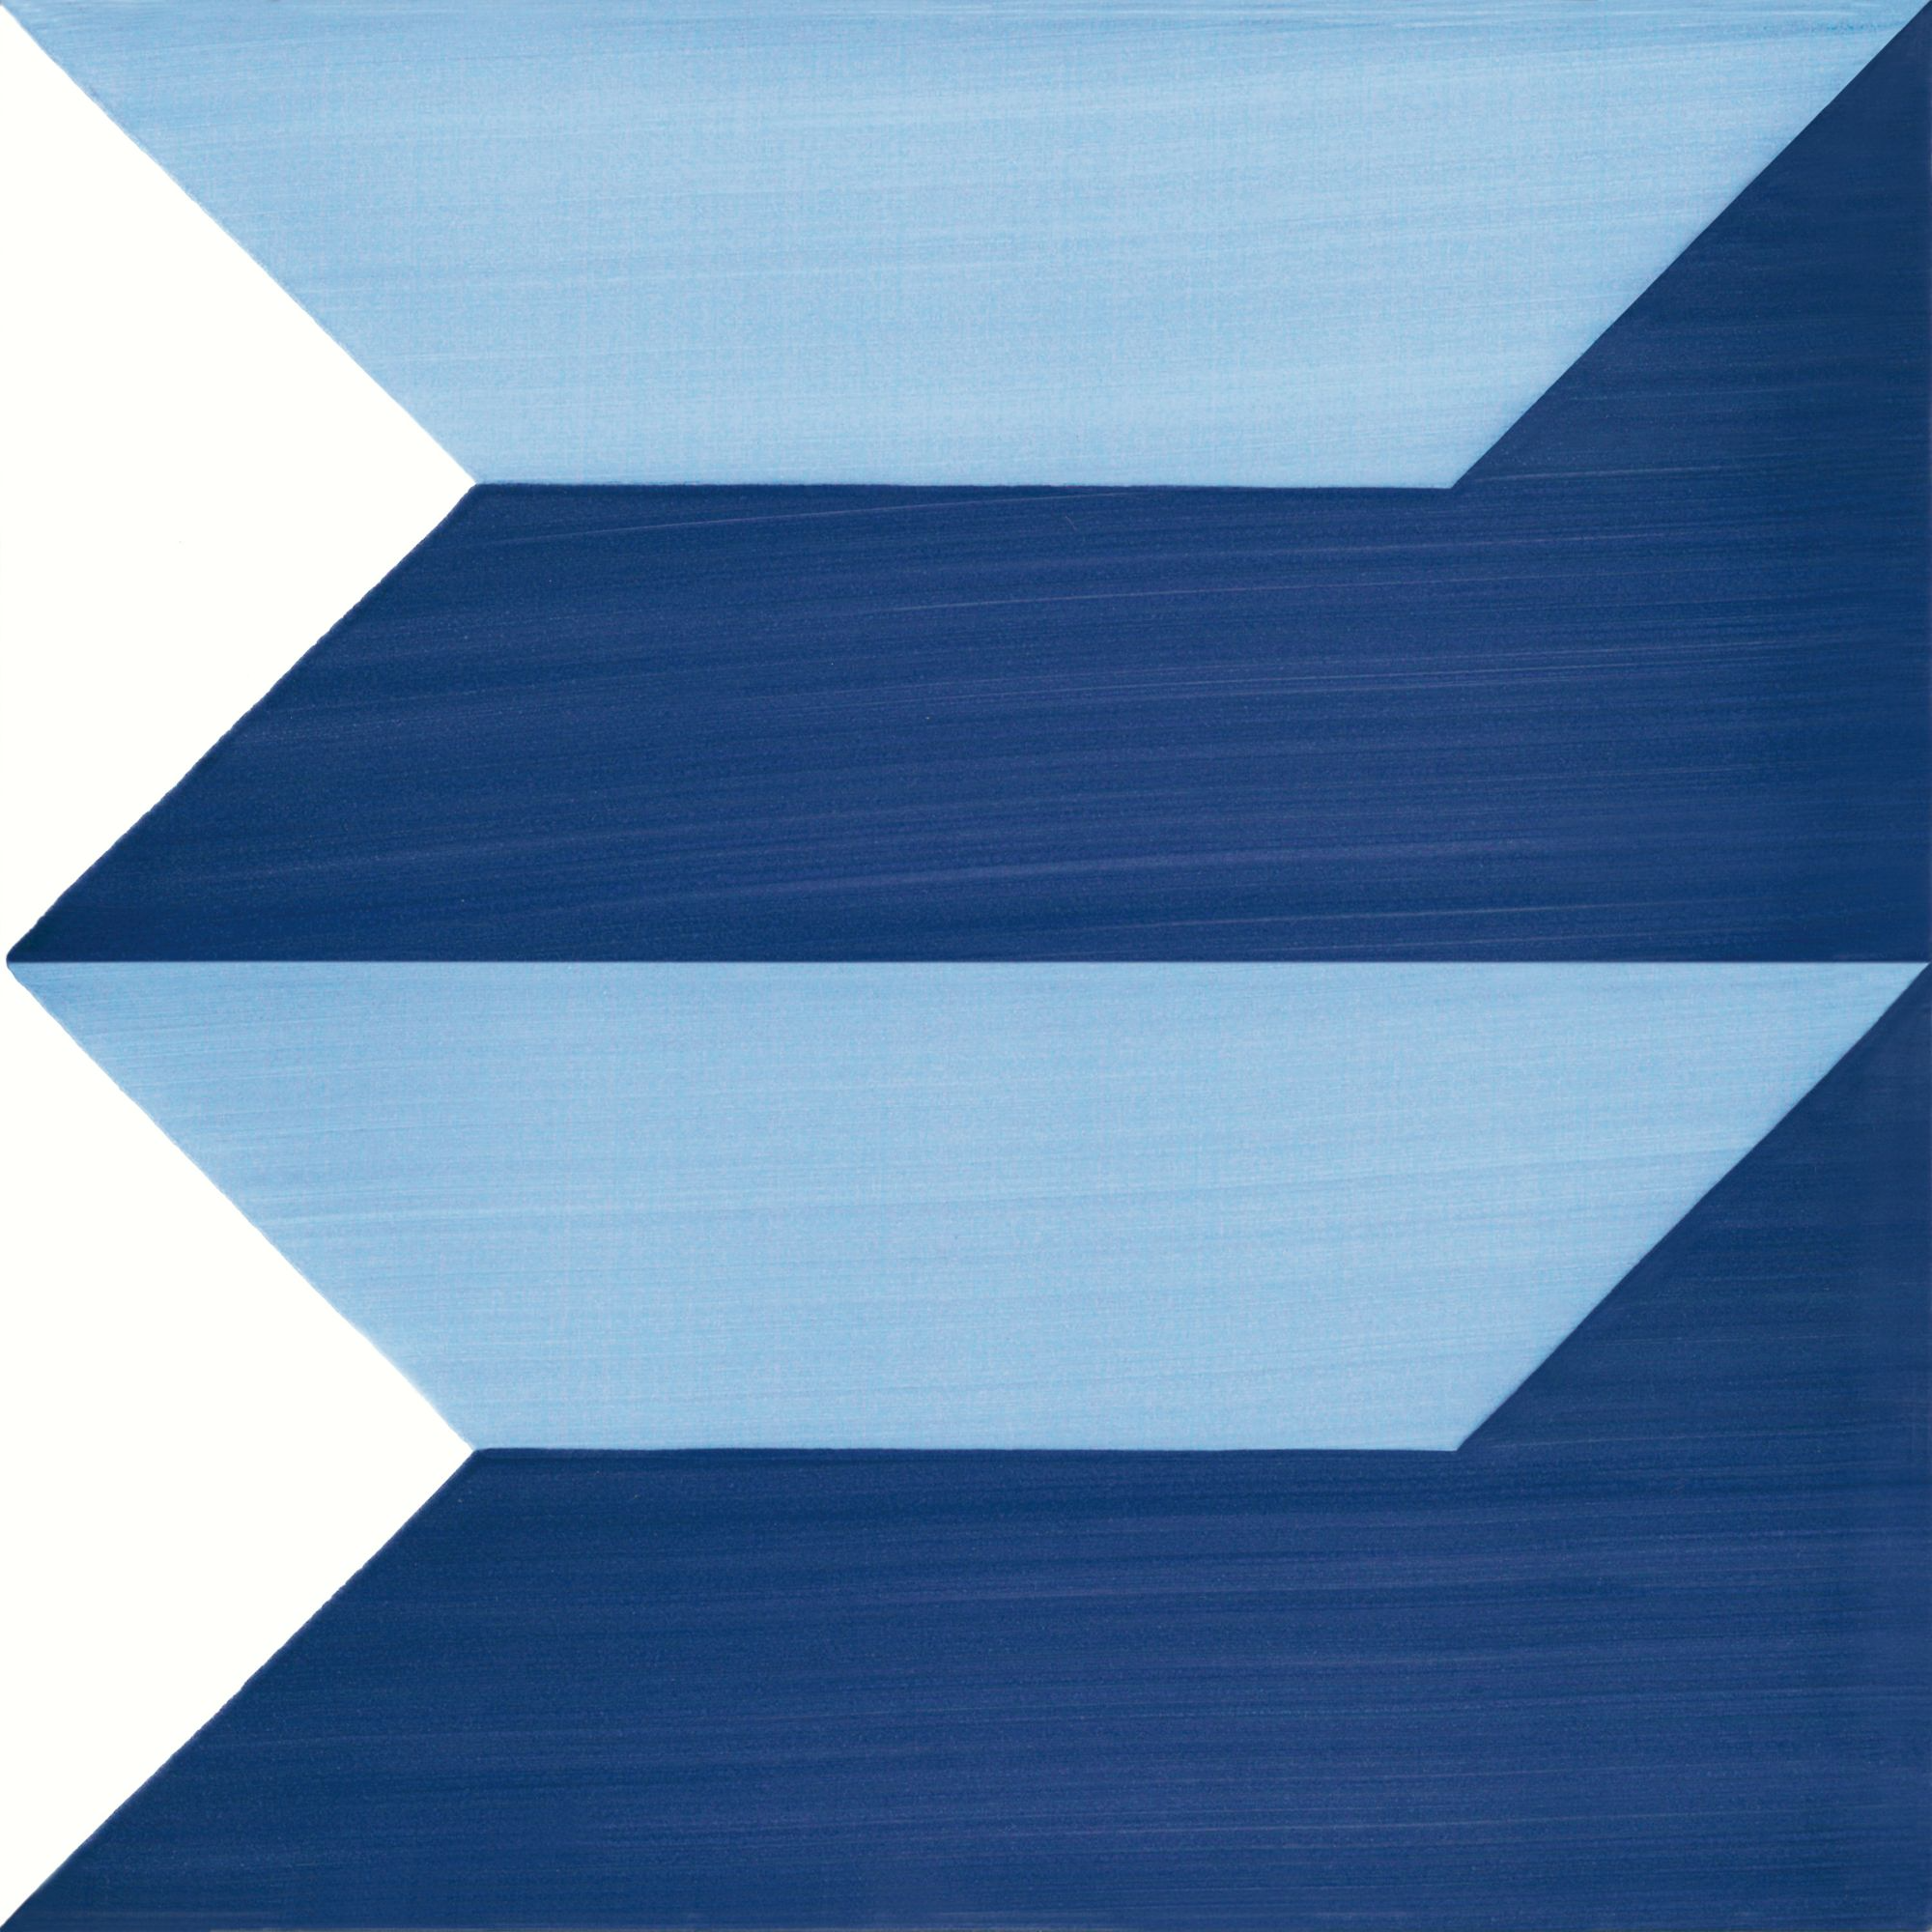 blu-ponti-decoro-tipo-16